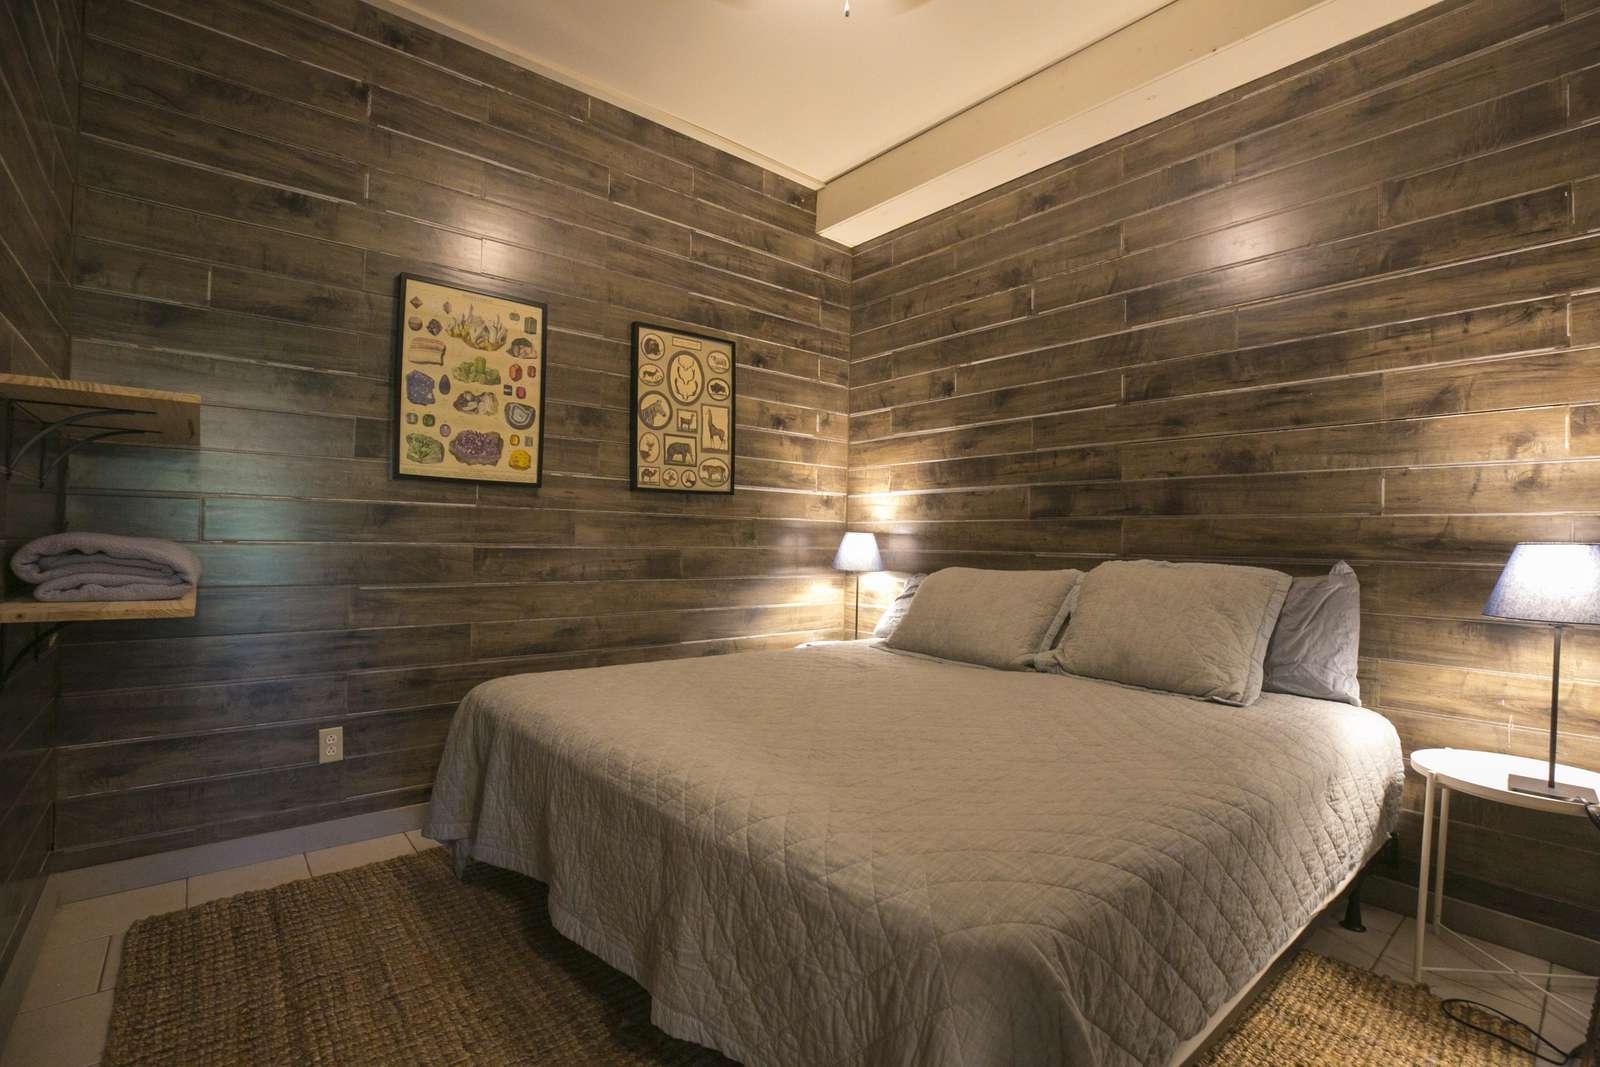 basement bedroom #1 (King bed)